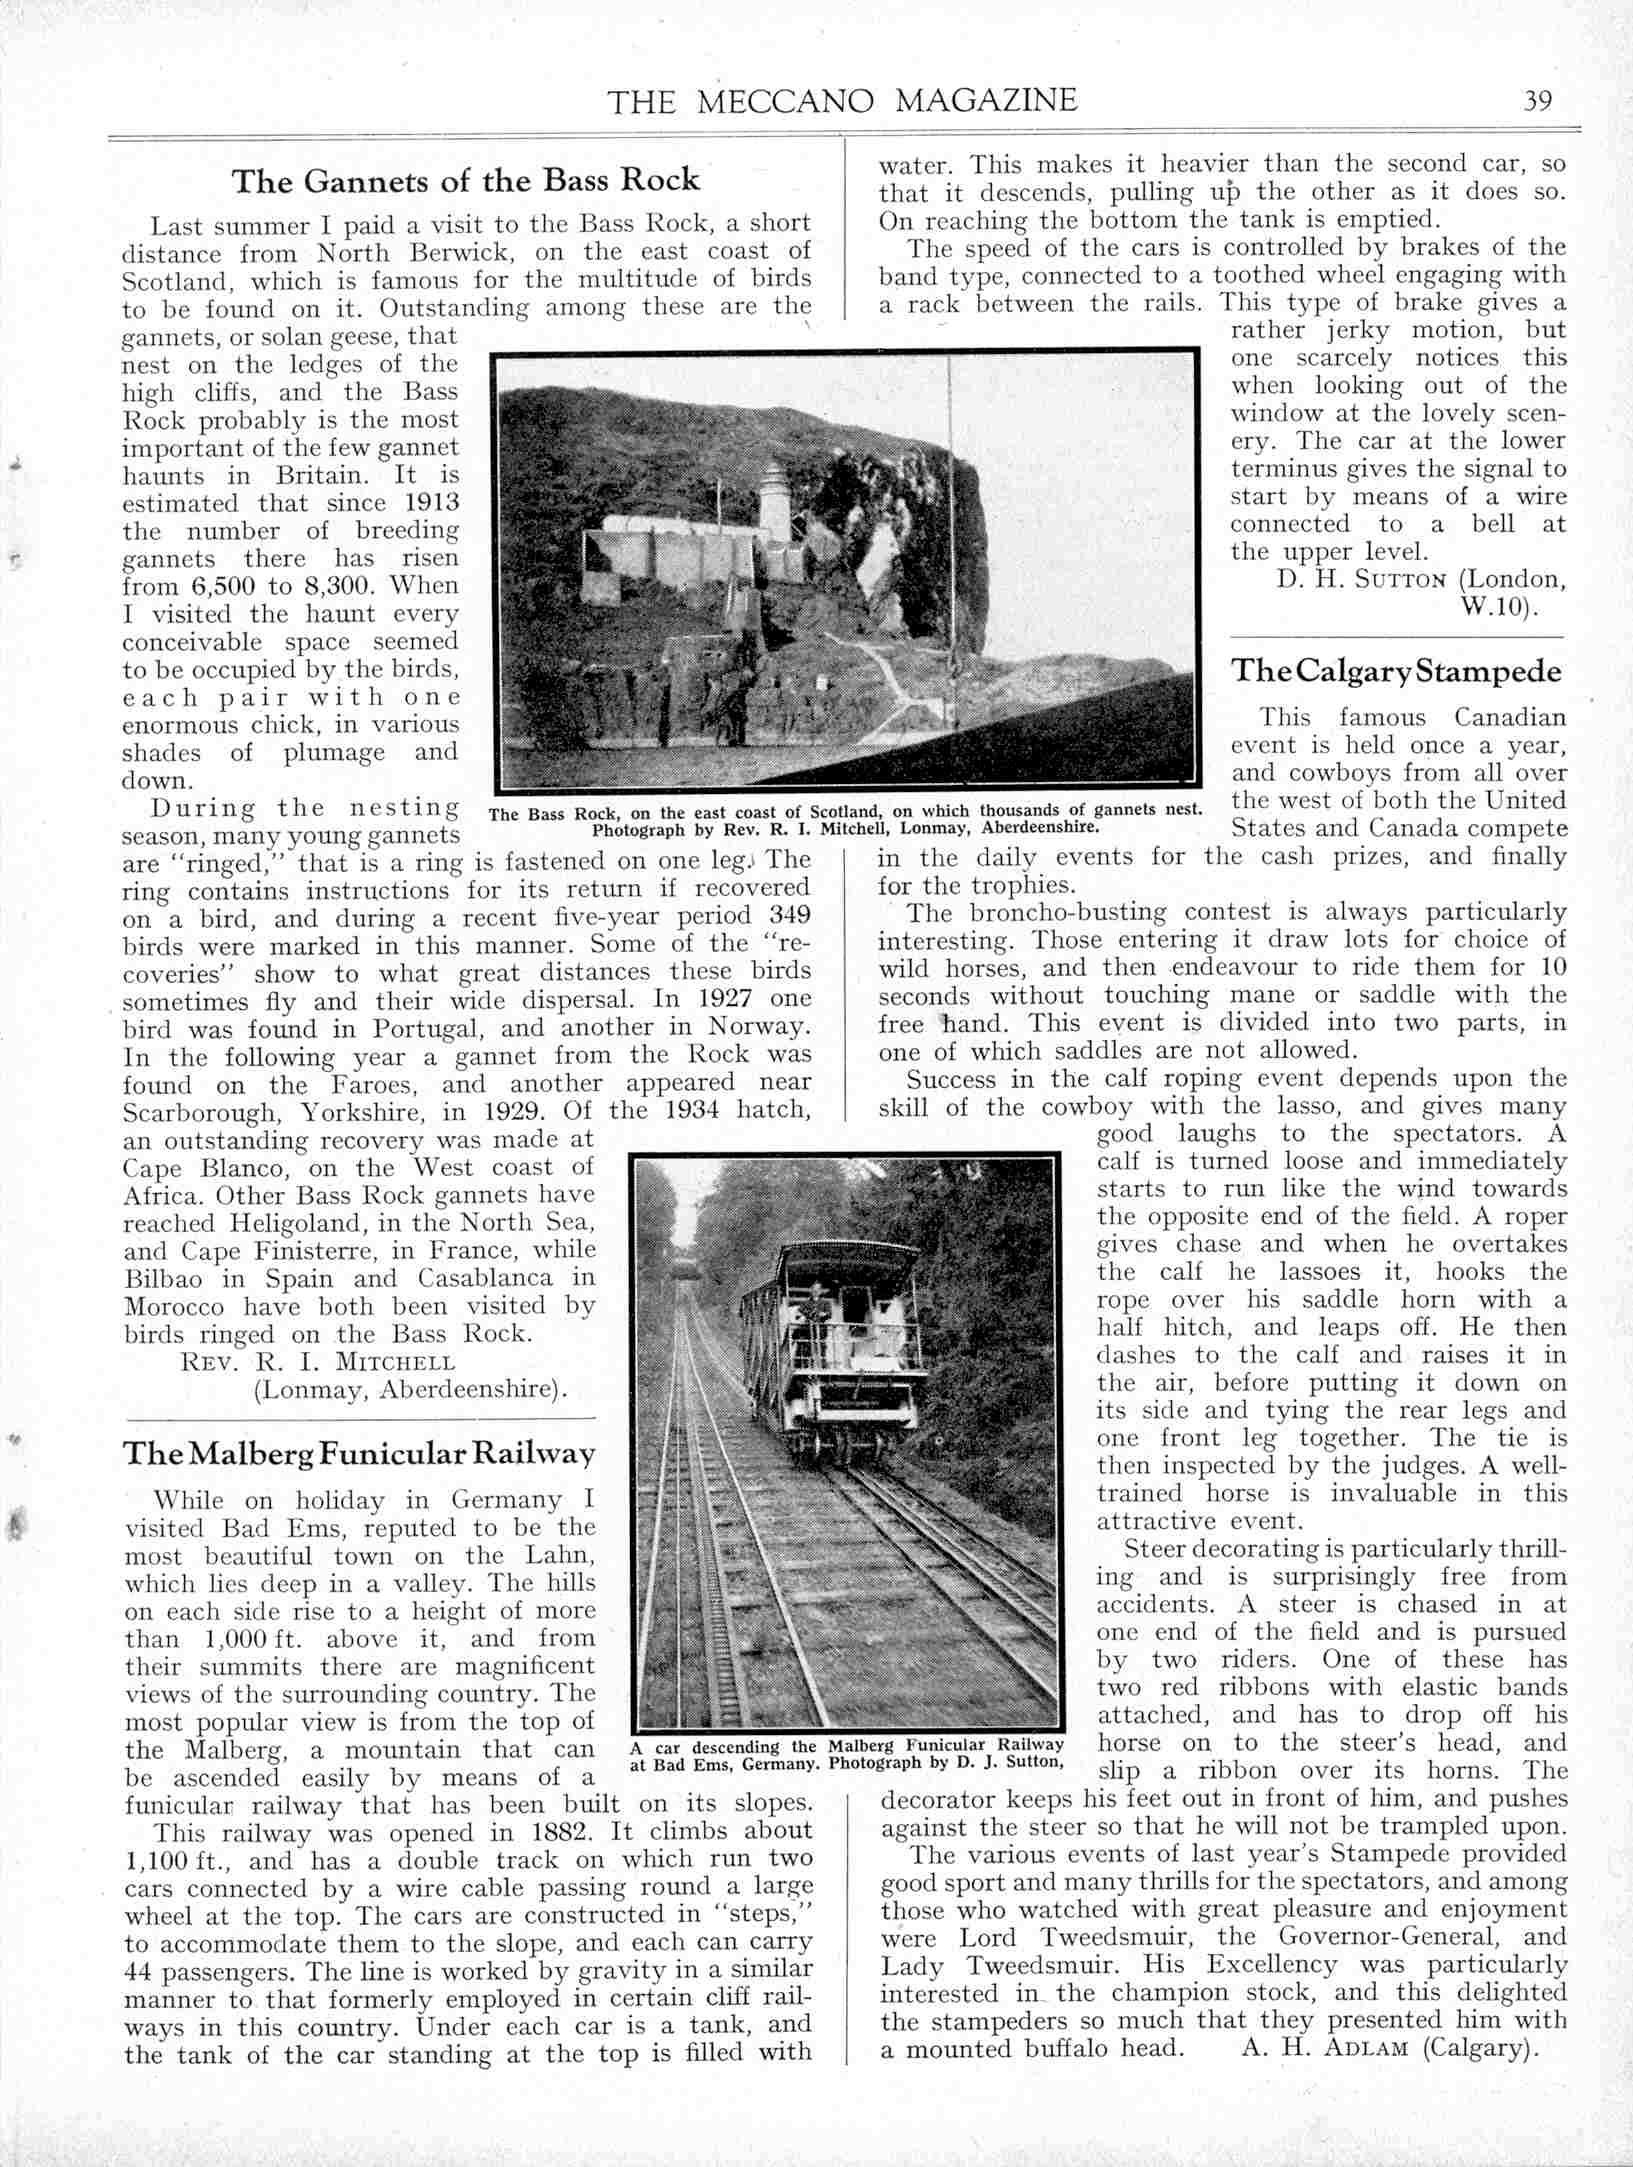 UK Meccano Magazine January 1938 Page 39